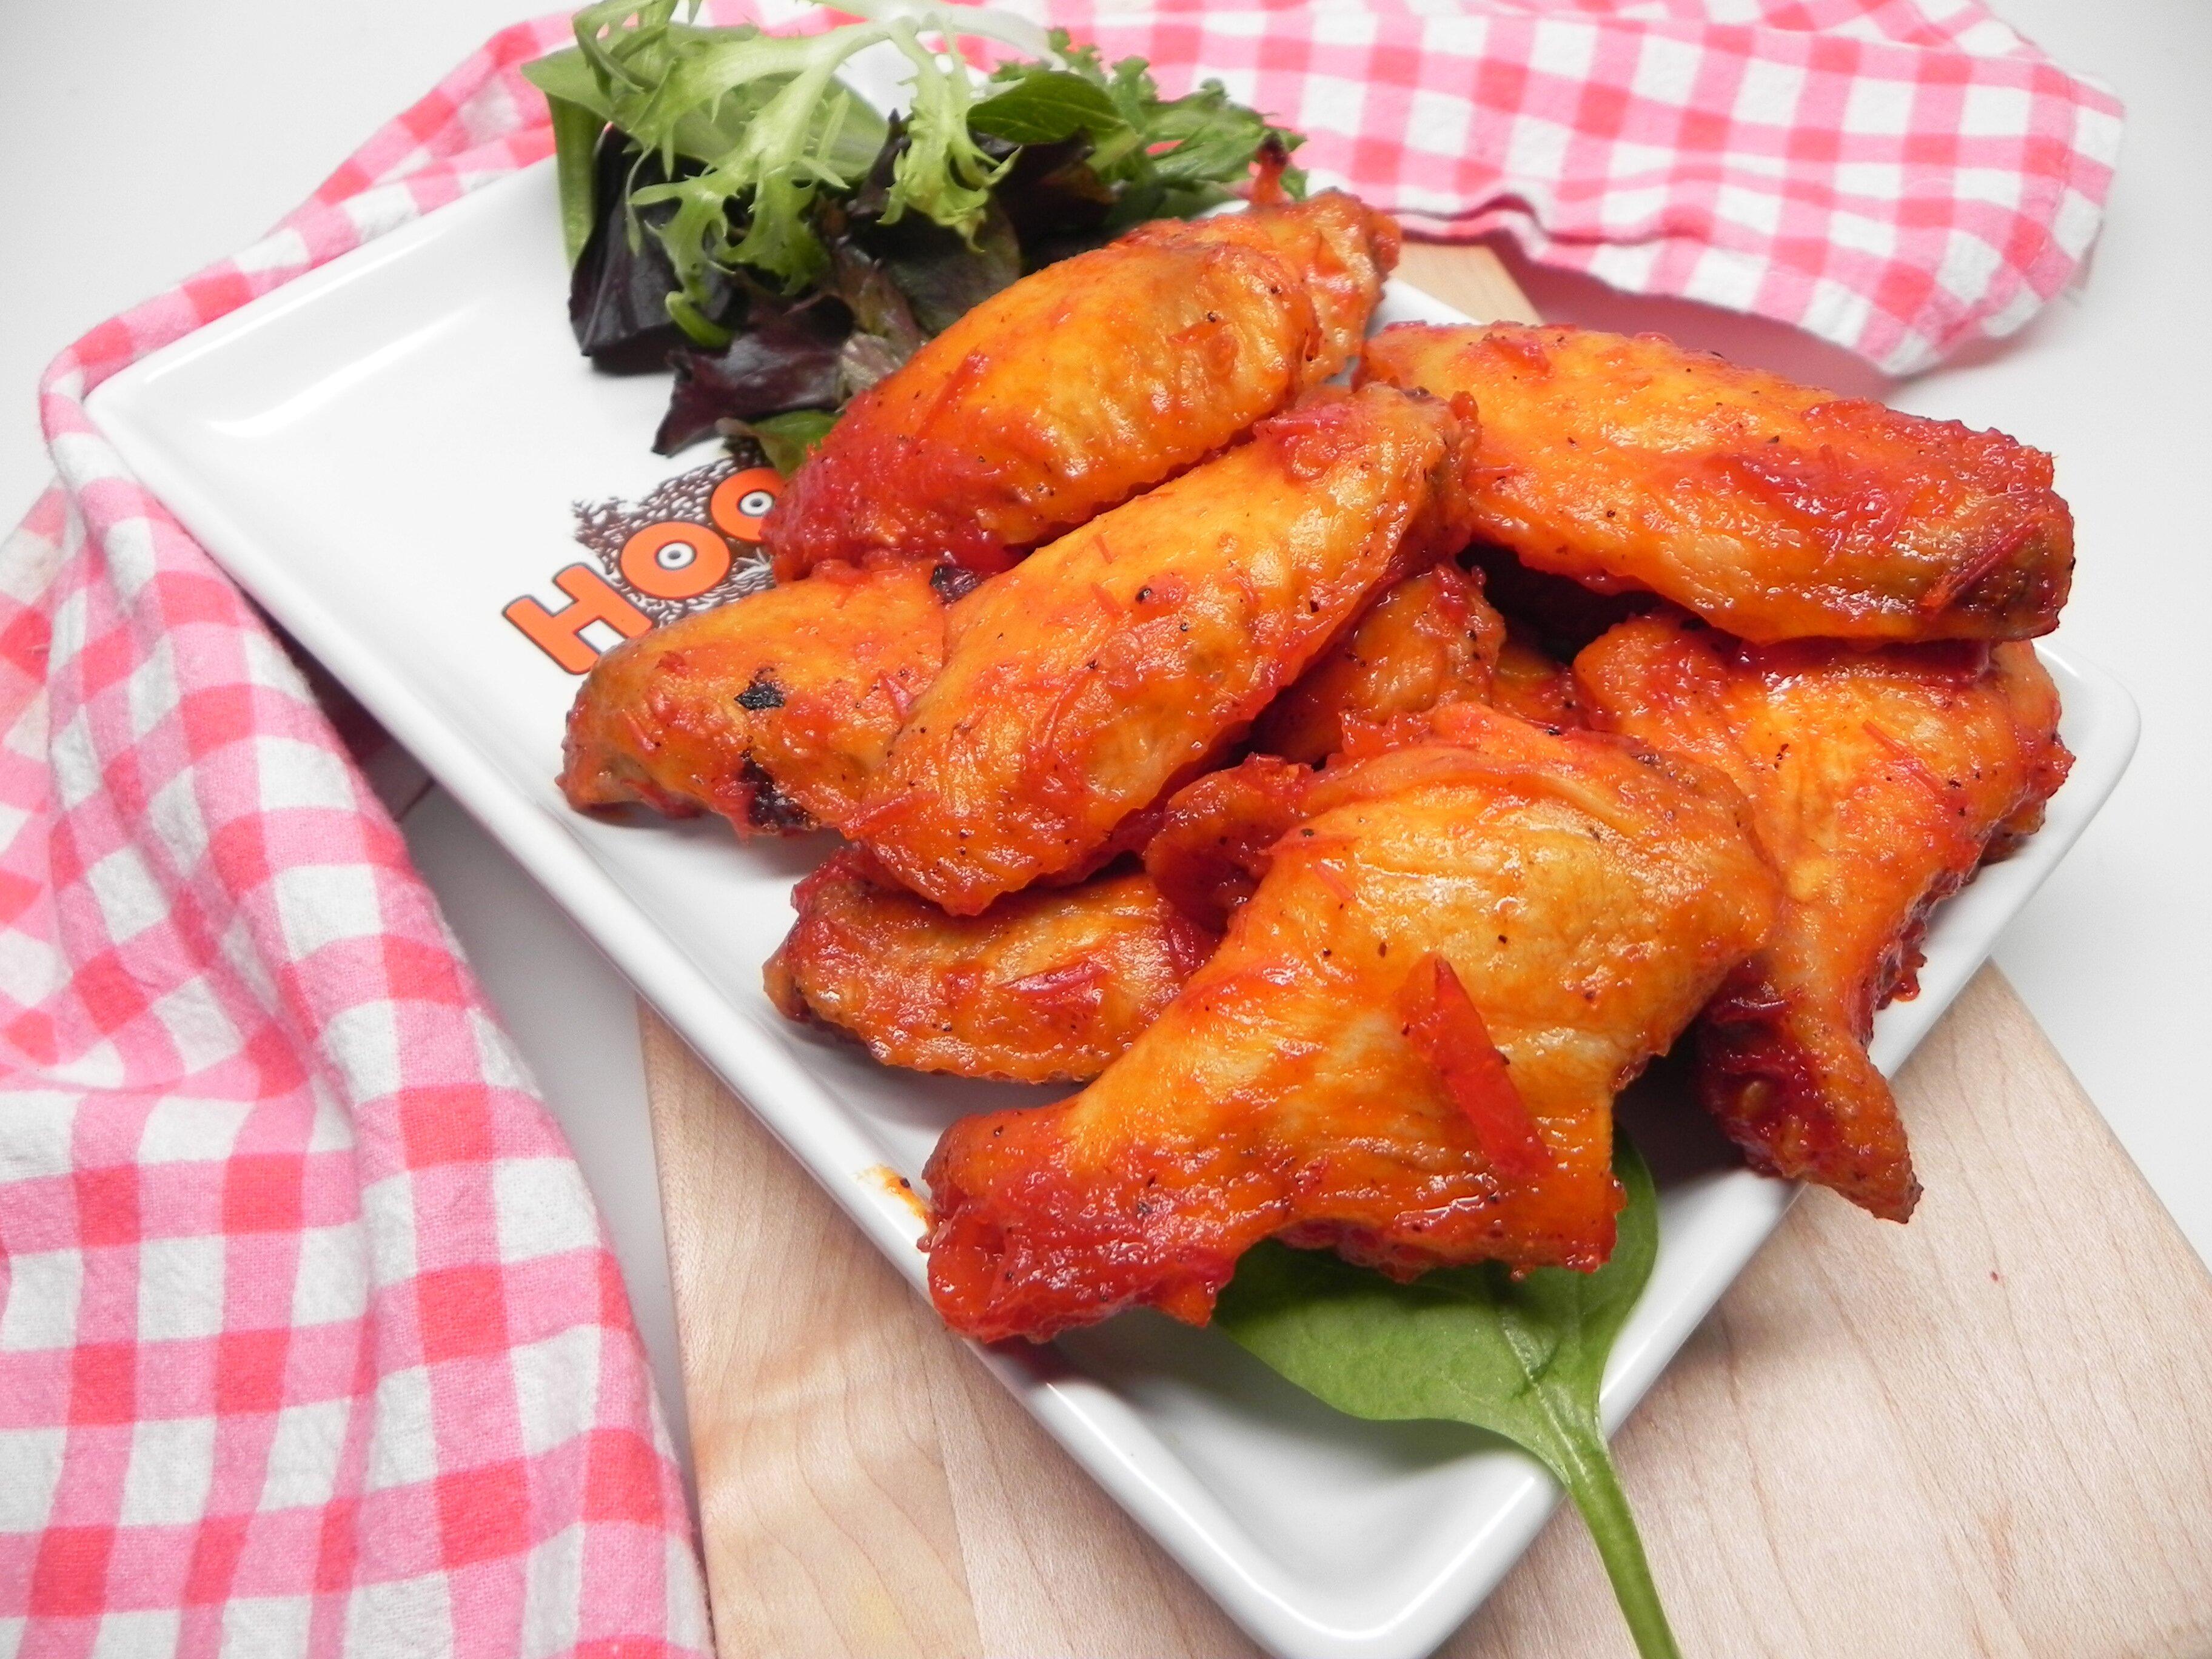 baked lemon pepper harissa wings recipe